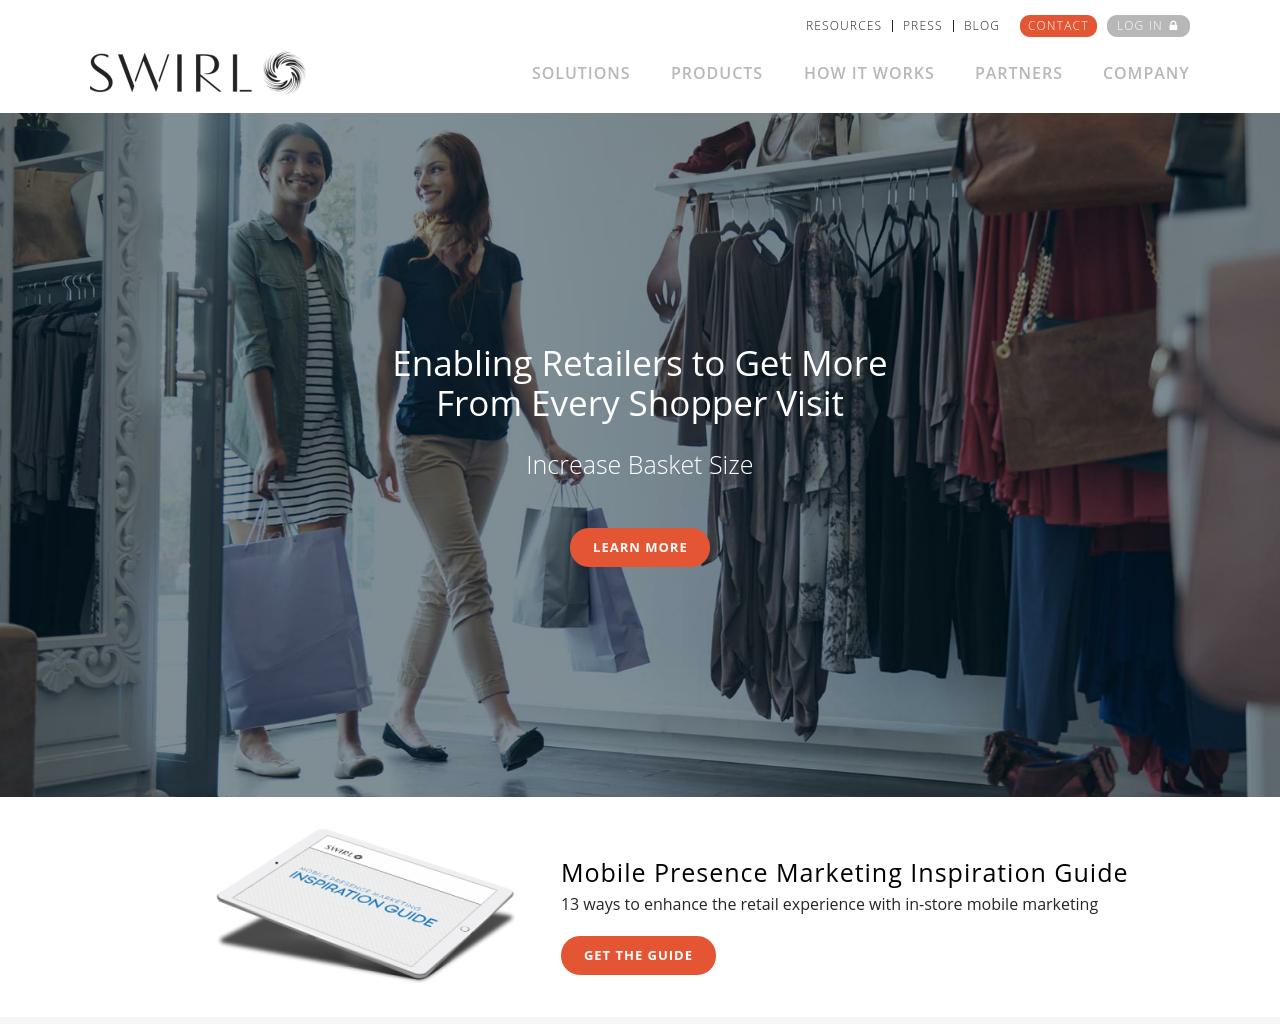 SWIRL-Advertising-Reviews-Pricing